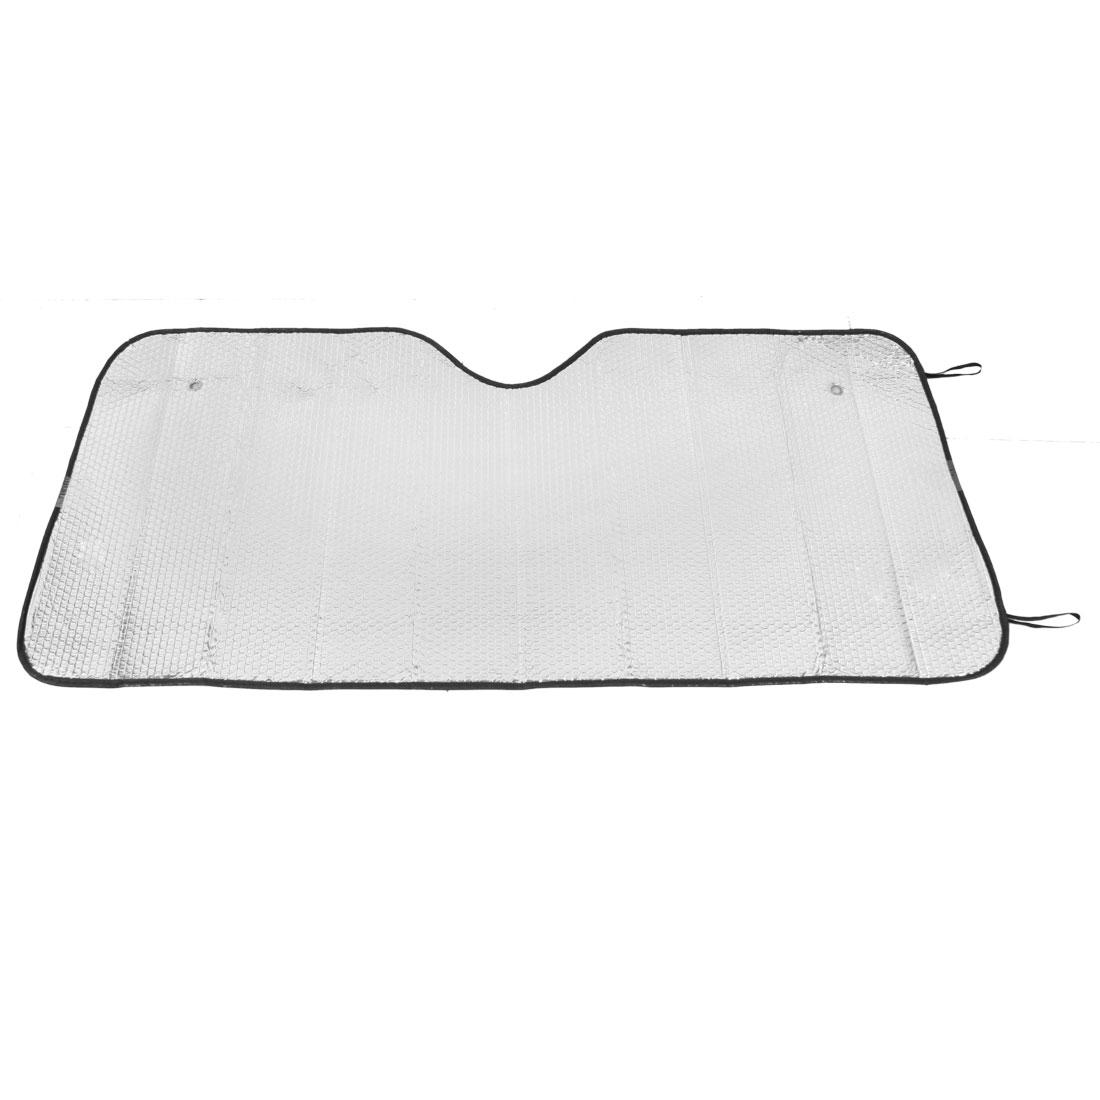 "Foldup Aluminum Foil Vehicle Car Shield Sunshade 50"" x 23.4"""